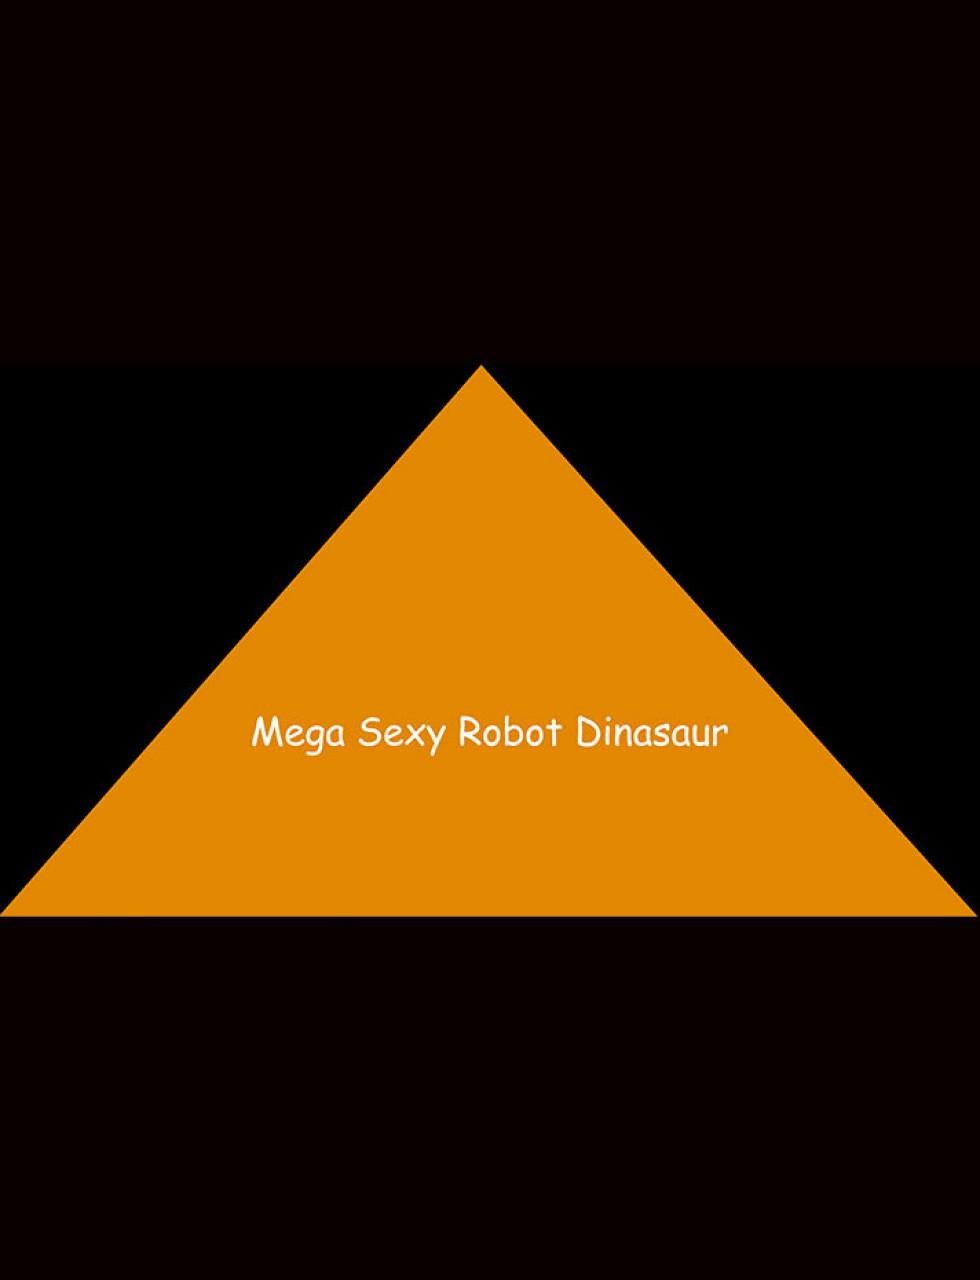 Poster Mega Sexy Robot Dinosaur